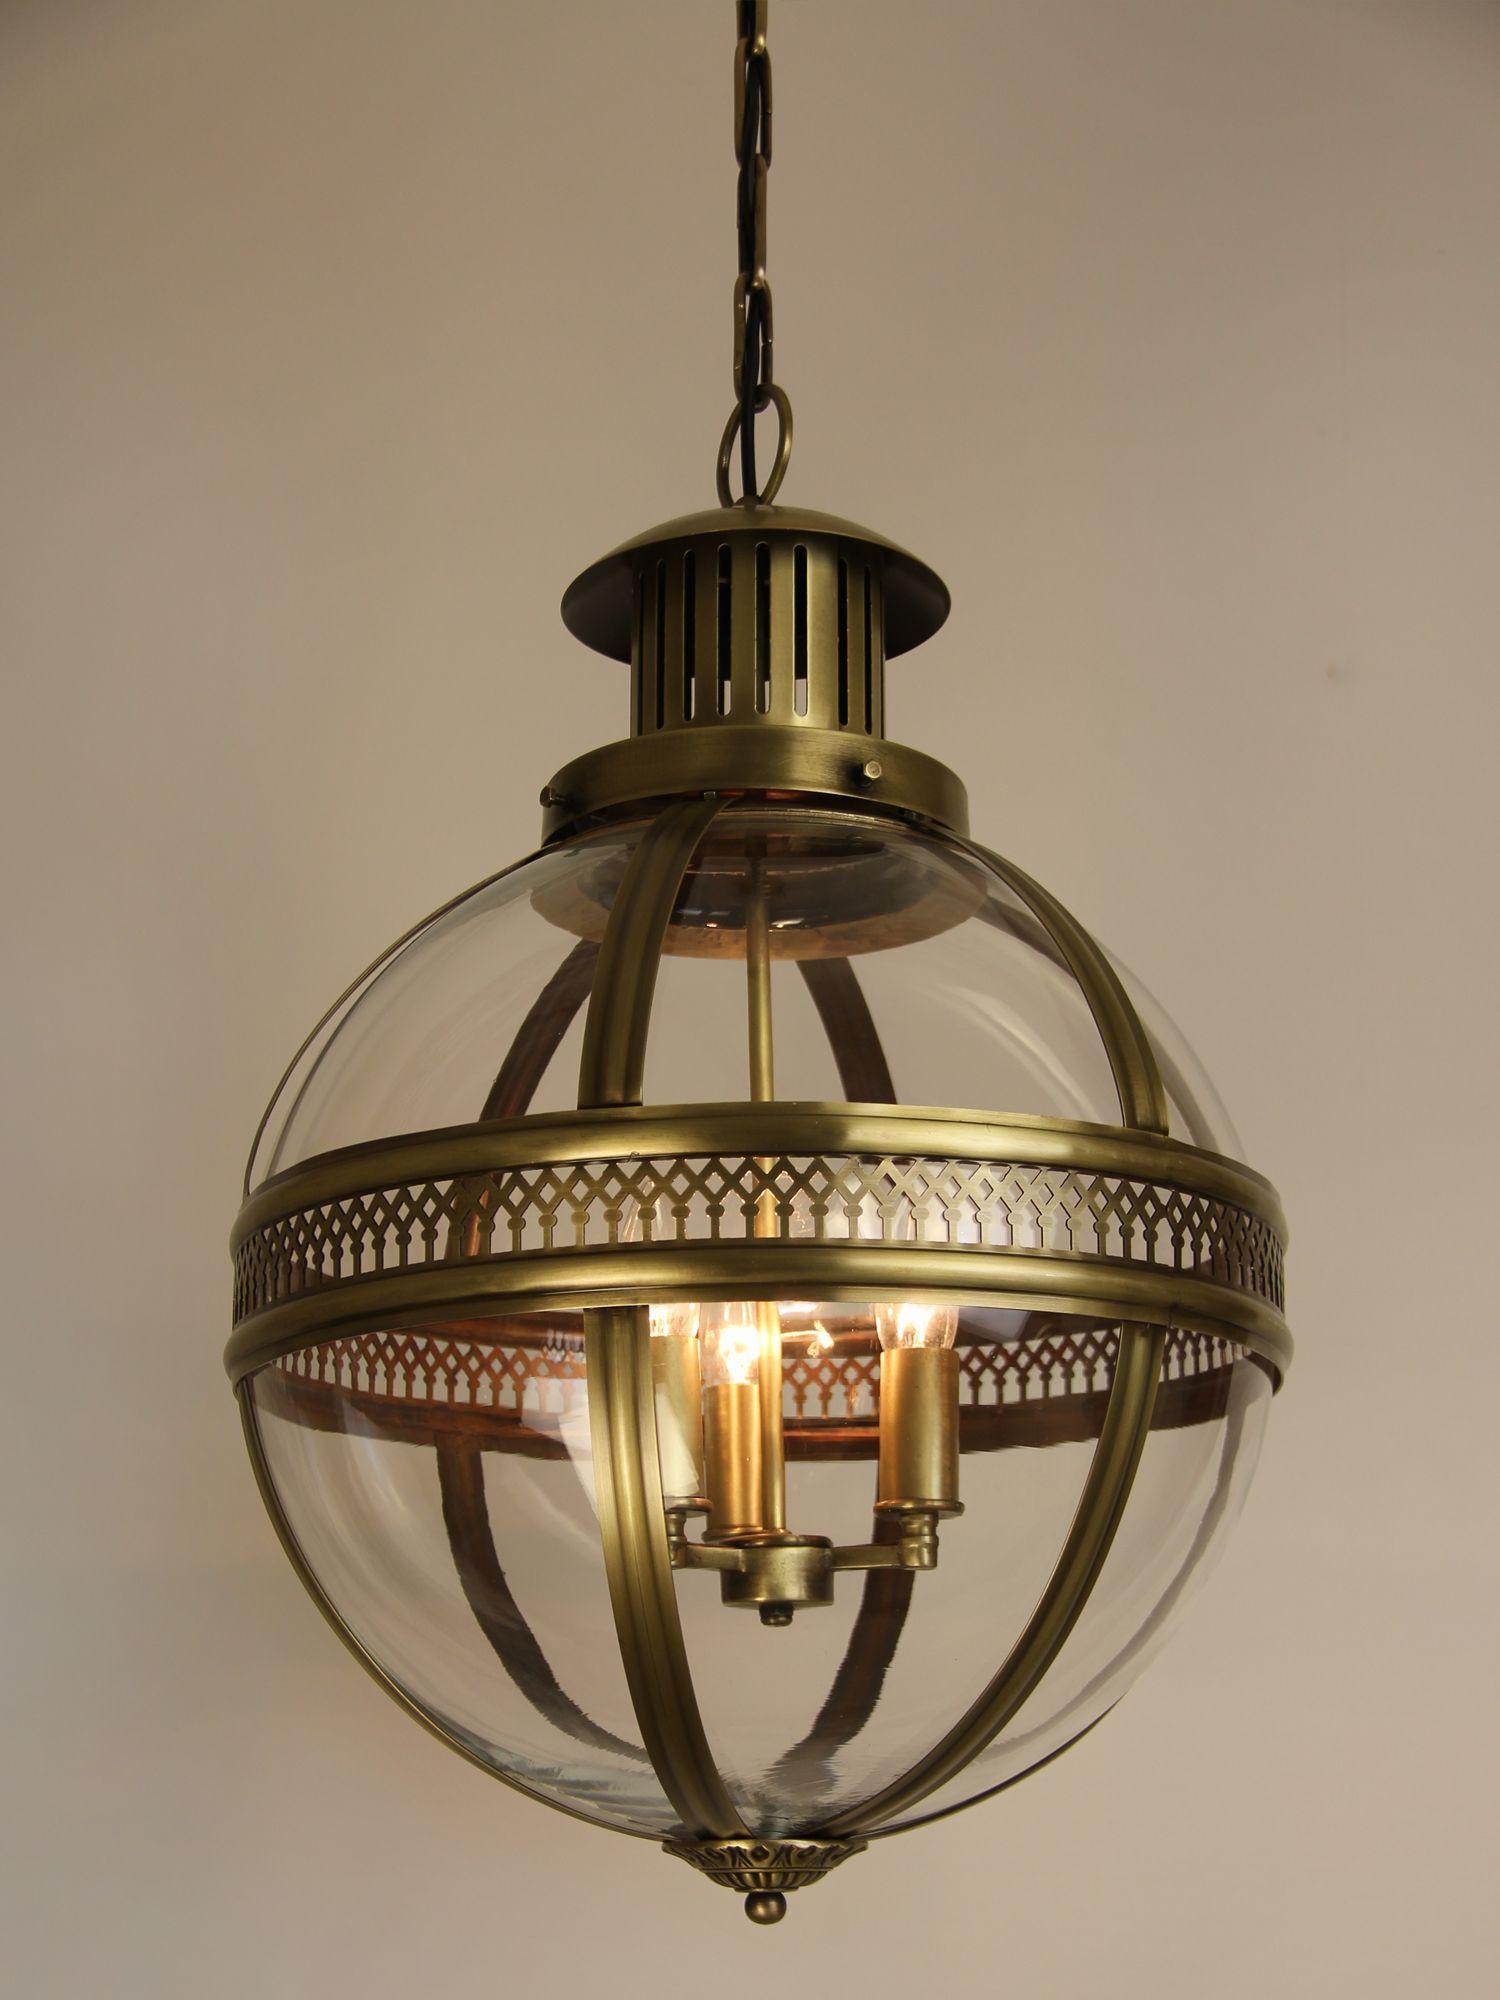 Trea Lighting  Victorian Hanging Lamp Design